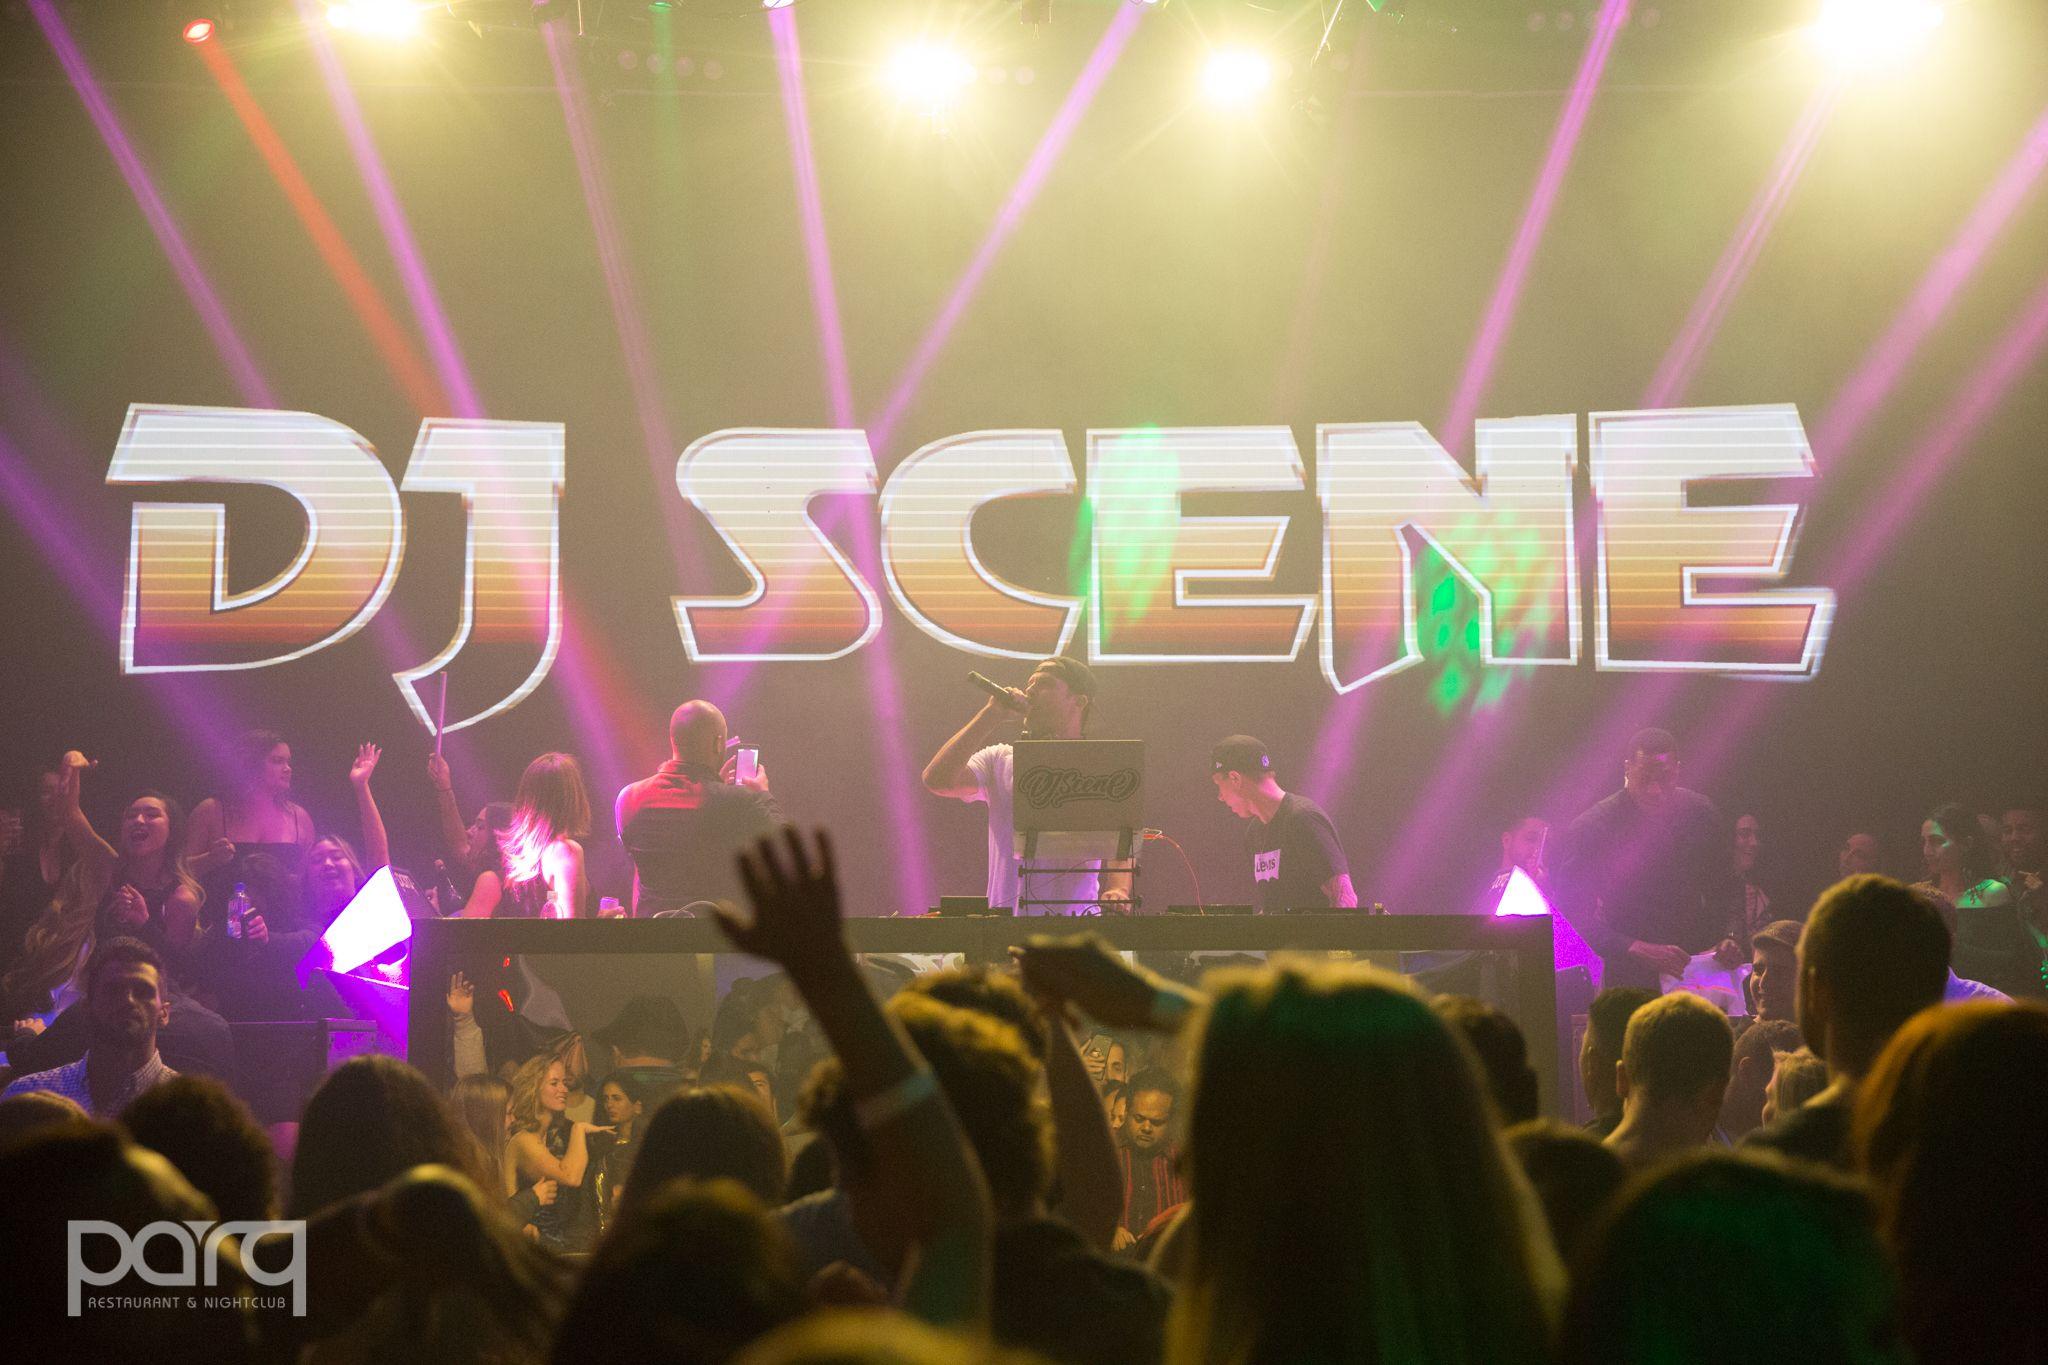 05.12.18 Parq - Scene-11.jpg